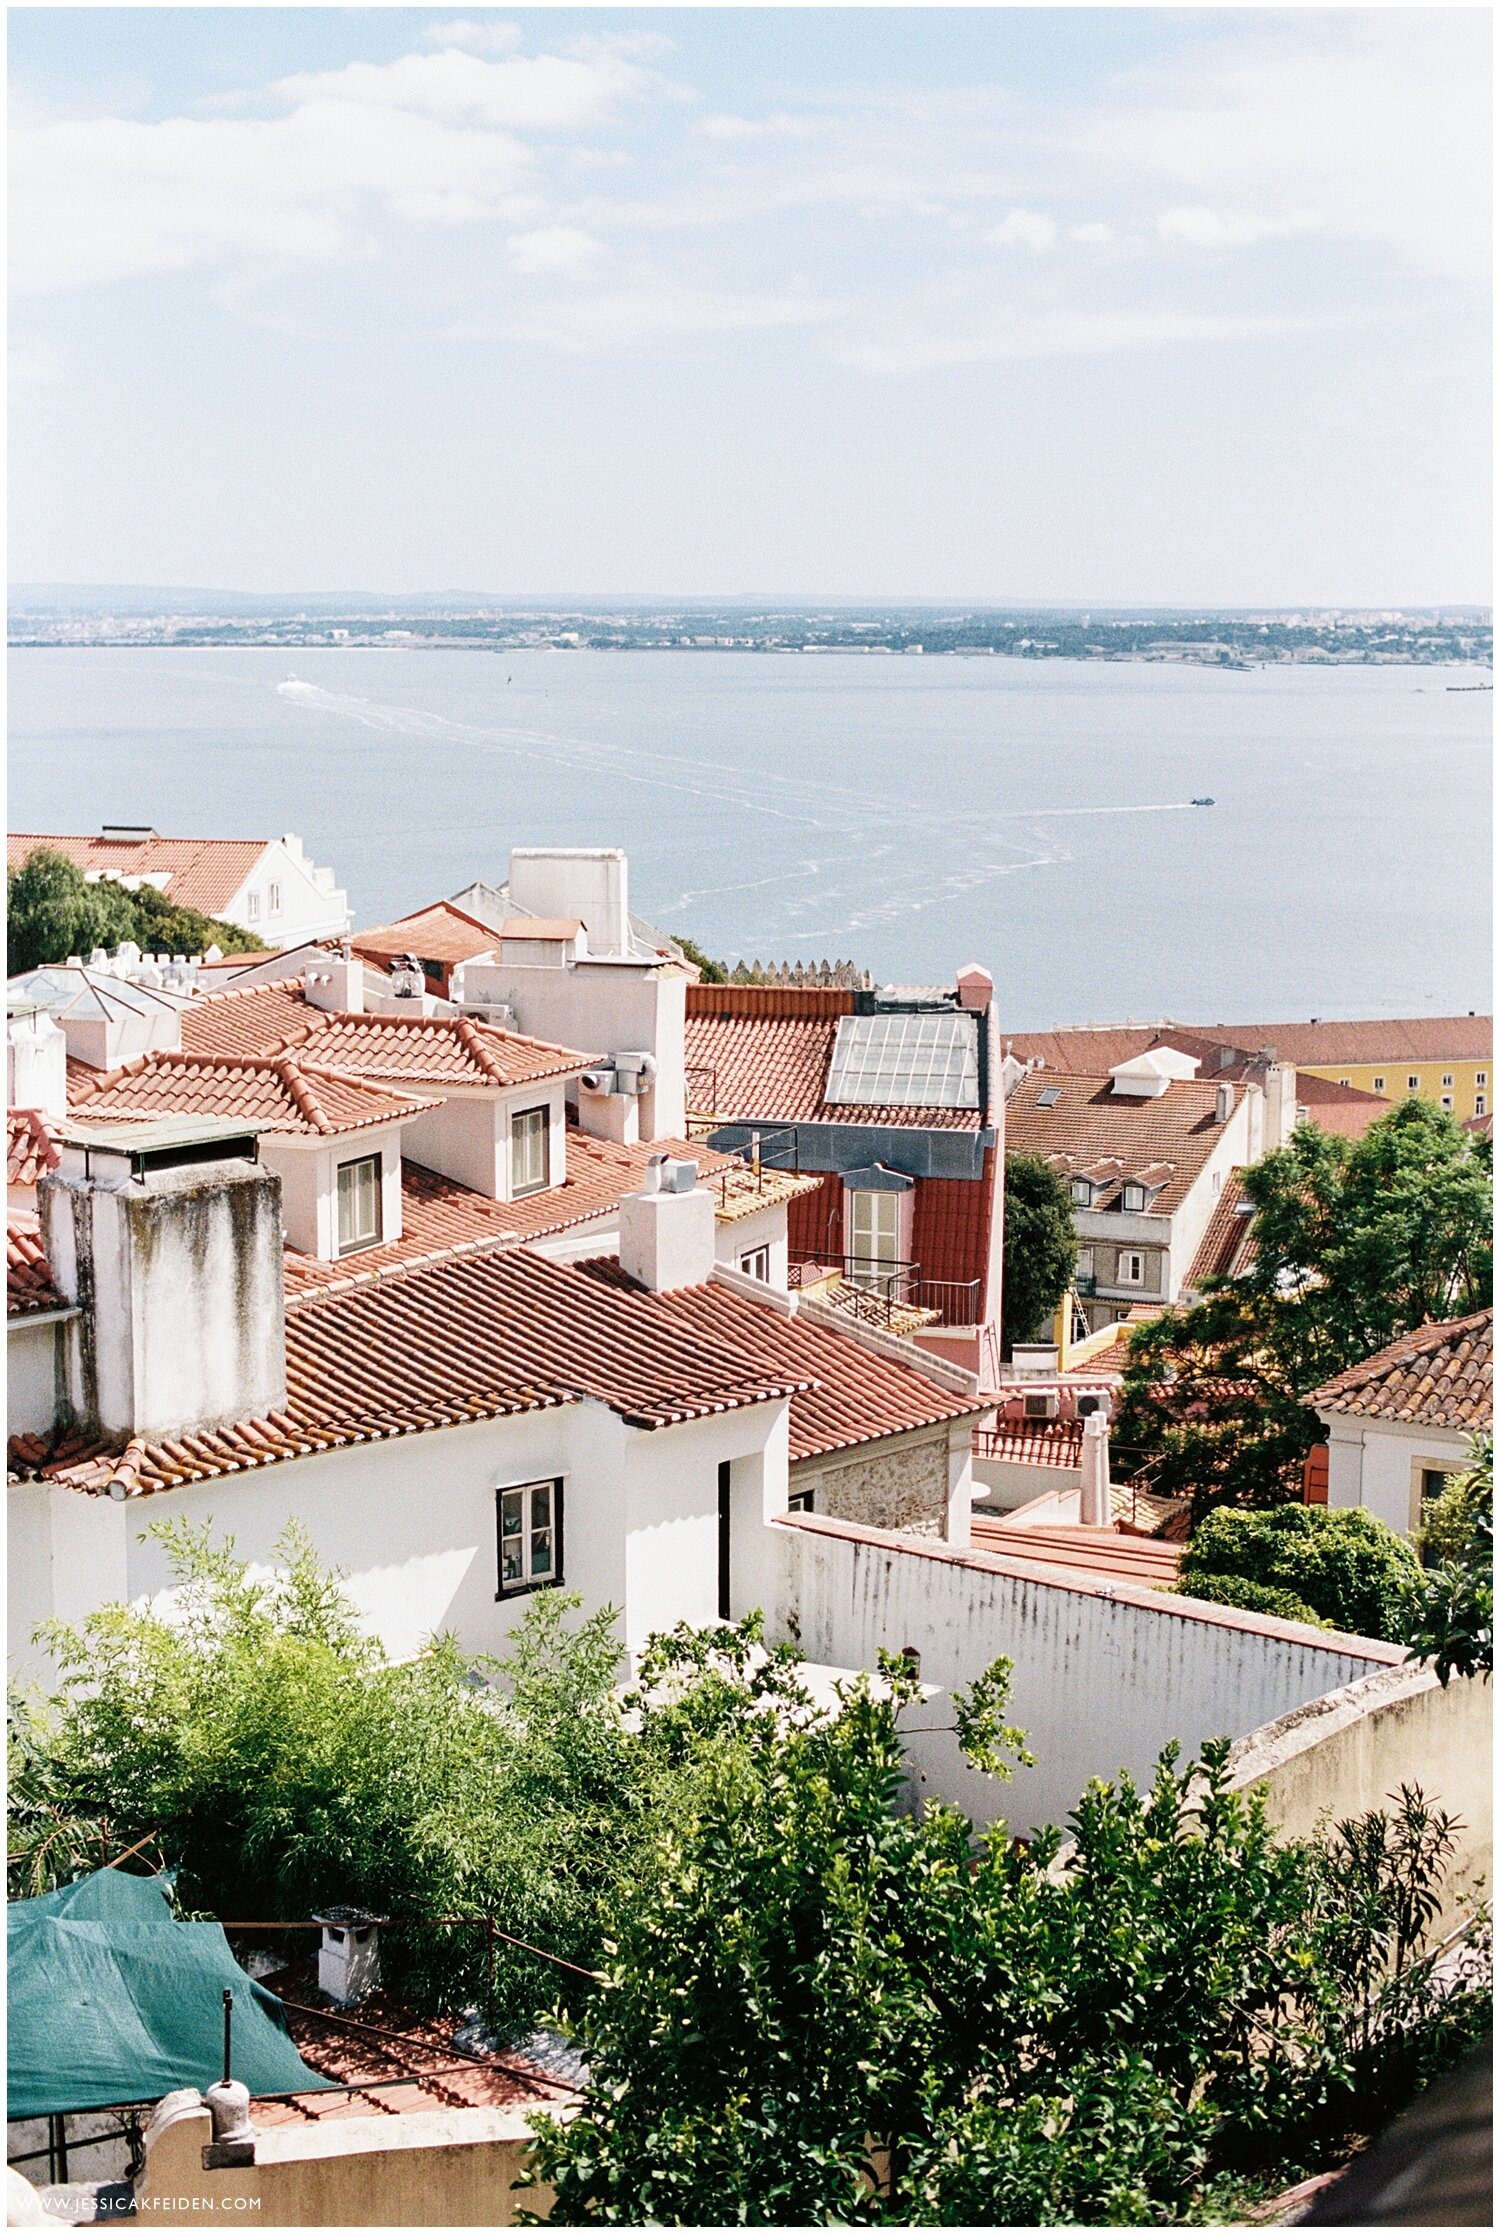 Jessica K Feiden Photography_Portugal Film Photographer_Portugal Travel Photographs_0016.jpg